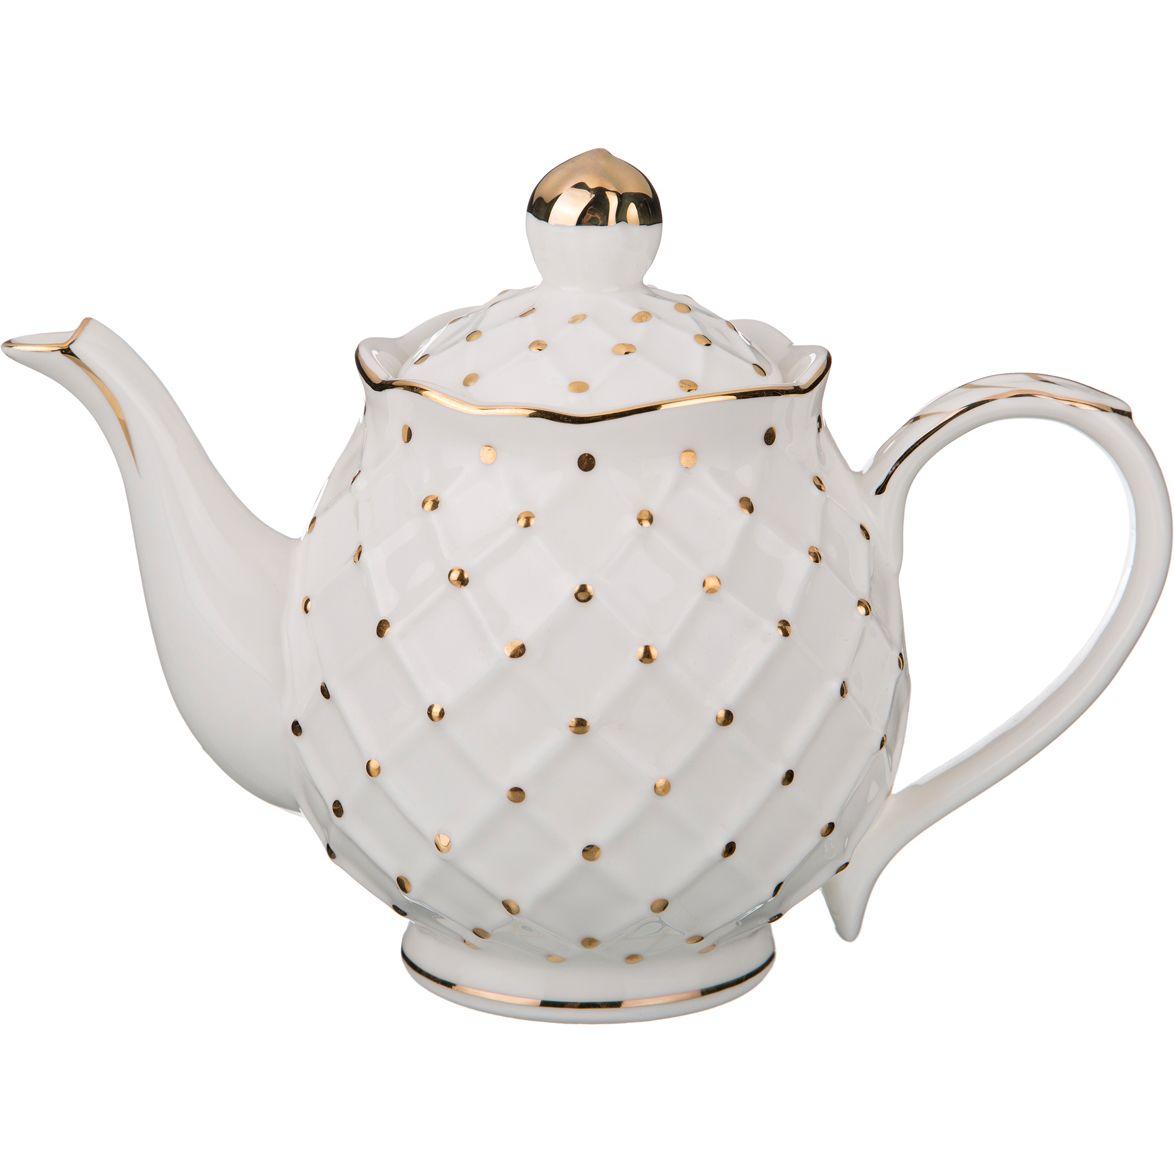 Заварочный чайник Lefard Bianca 530 мл